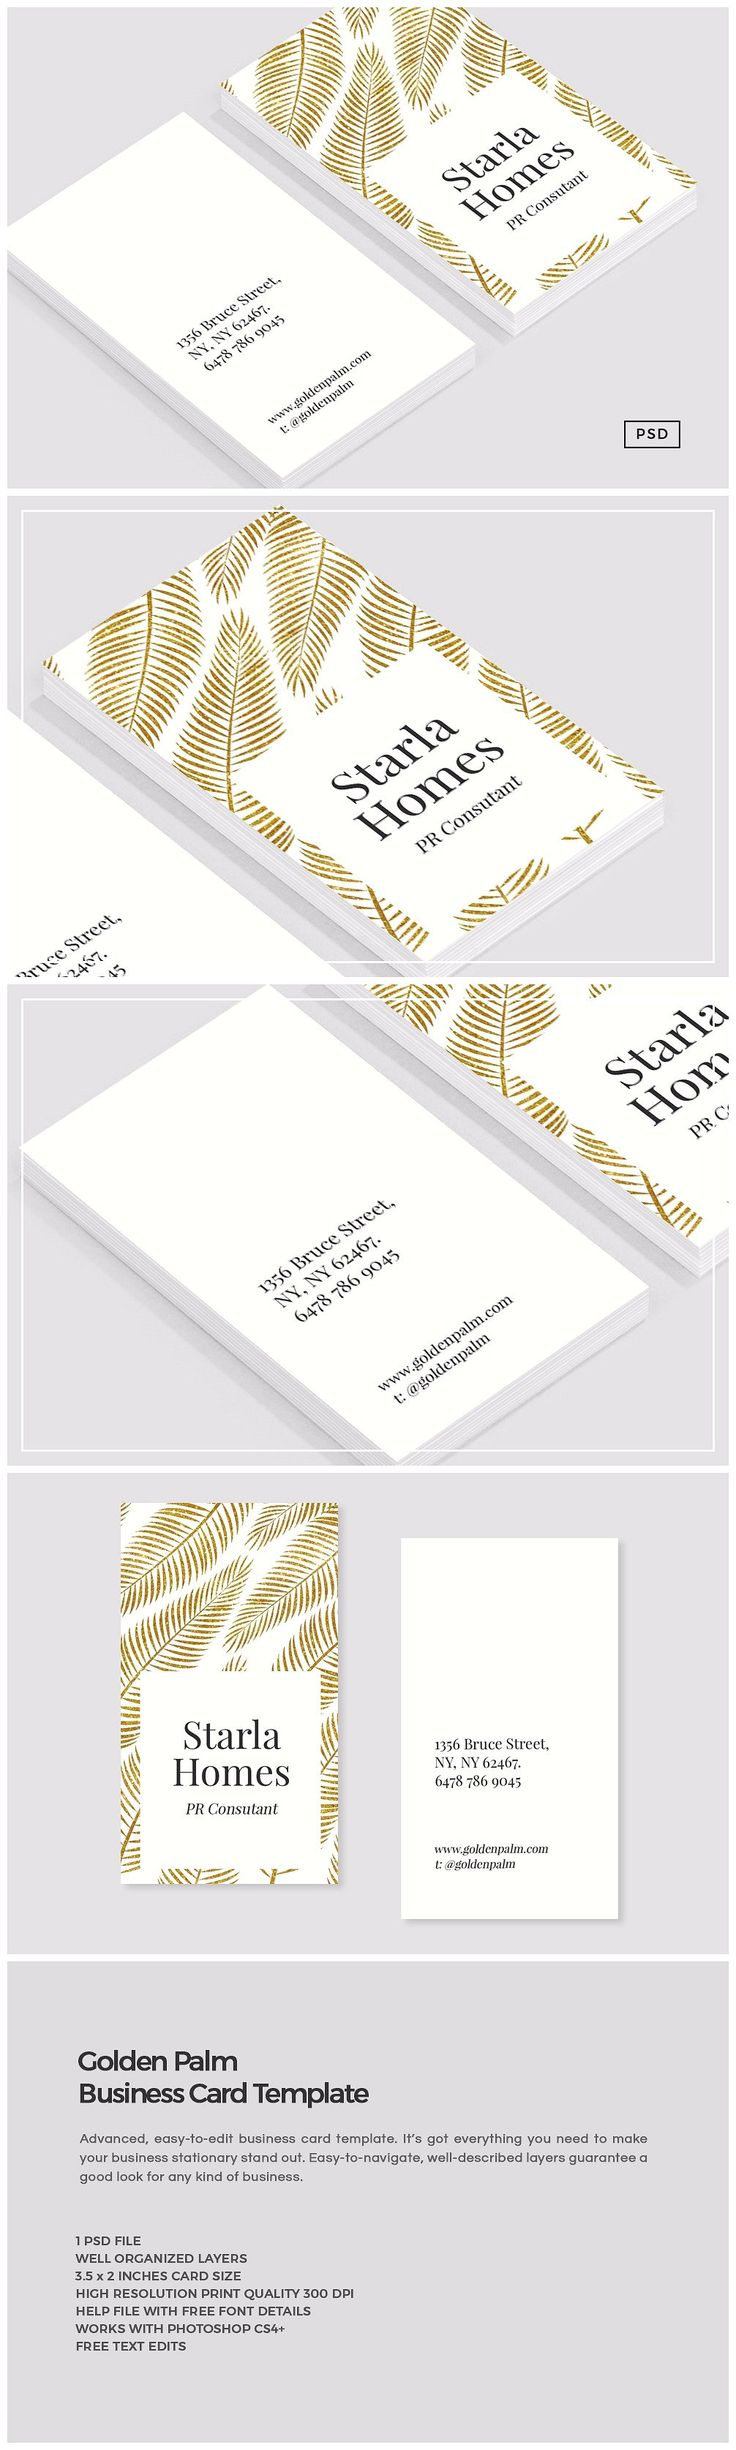 Quickbooks Invoice Templates » got print business card template ...